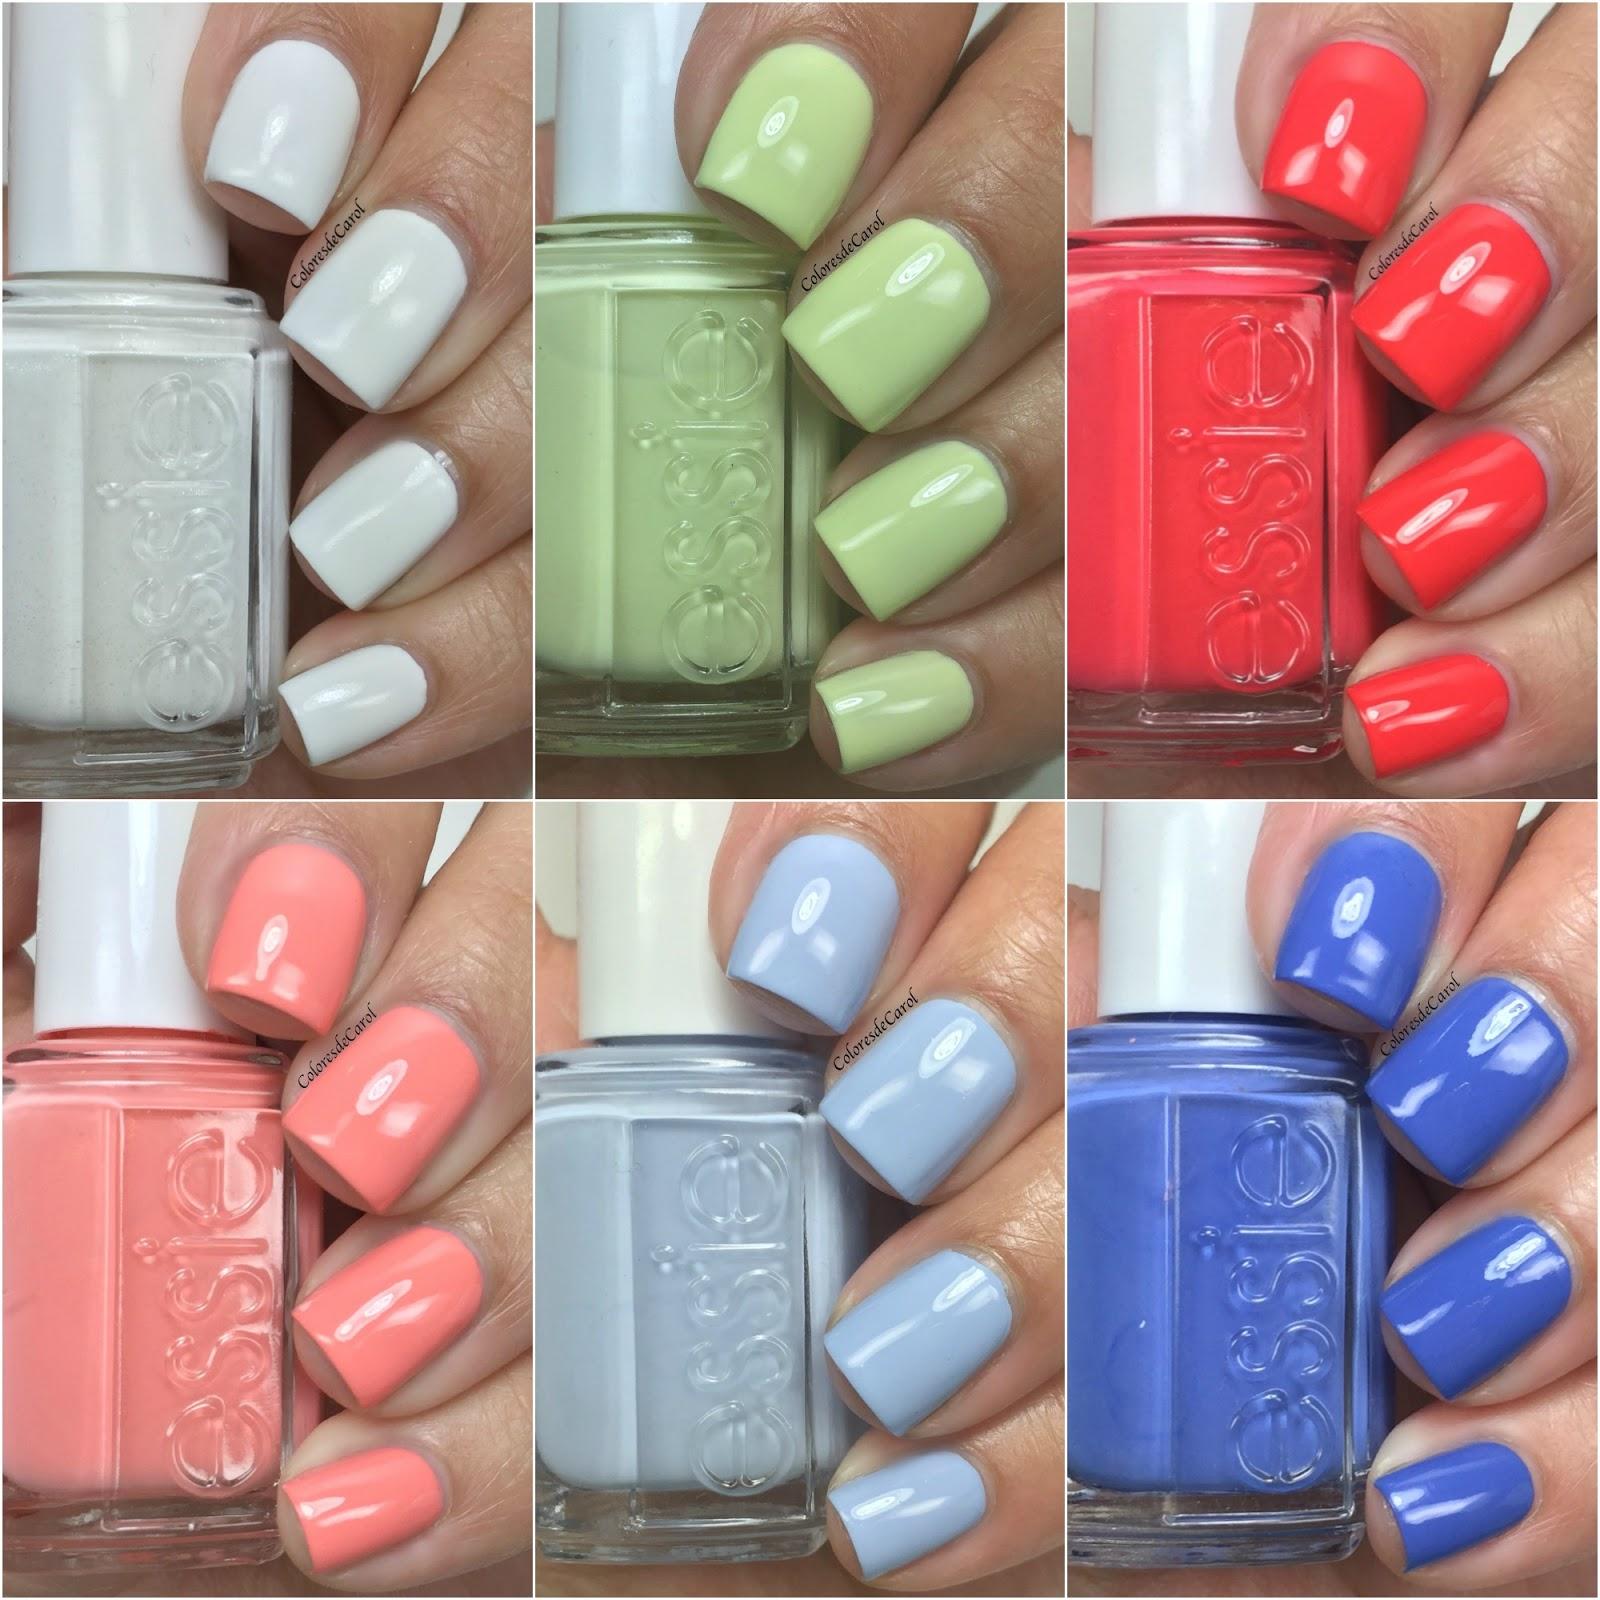 Colores de Carol: Essie Peach Side Babe, Summer 2015